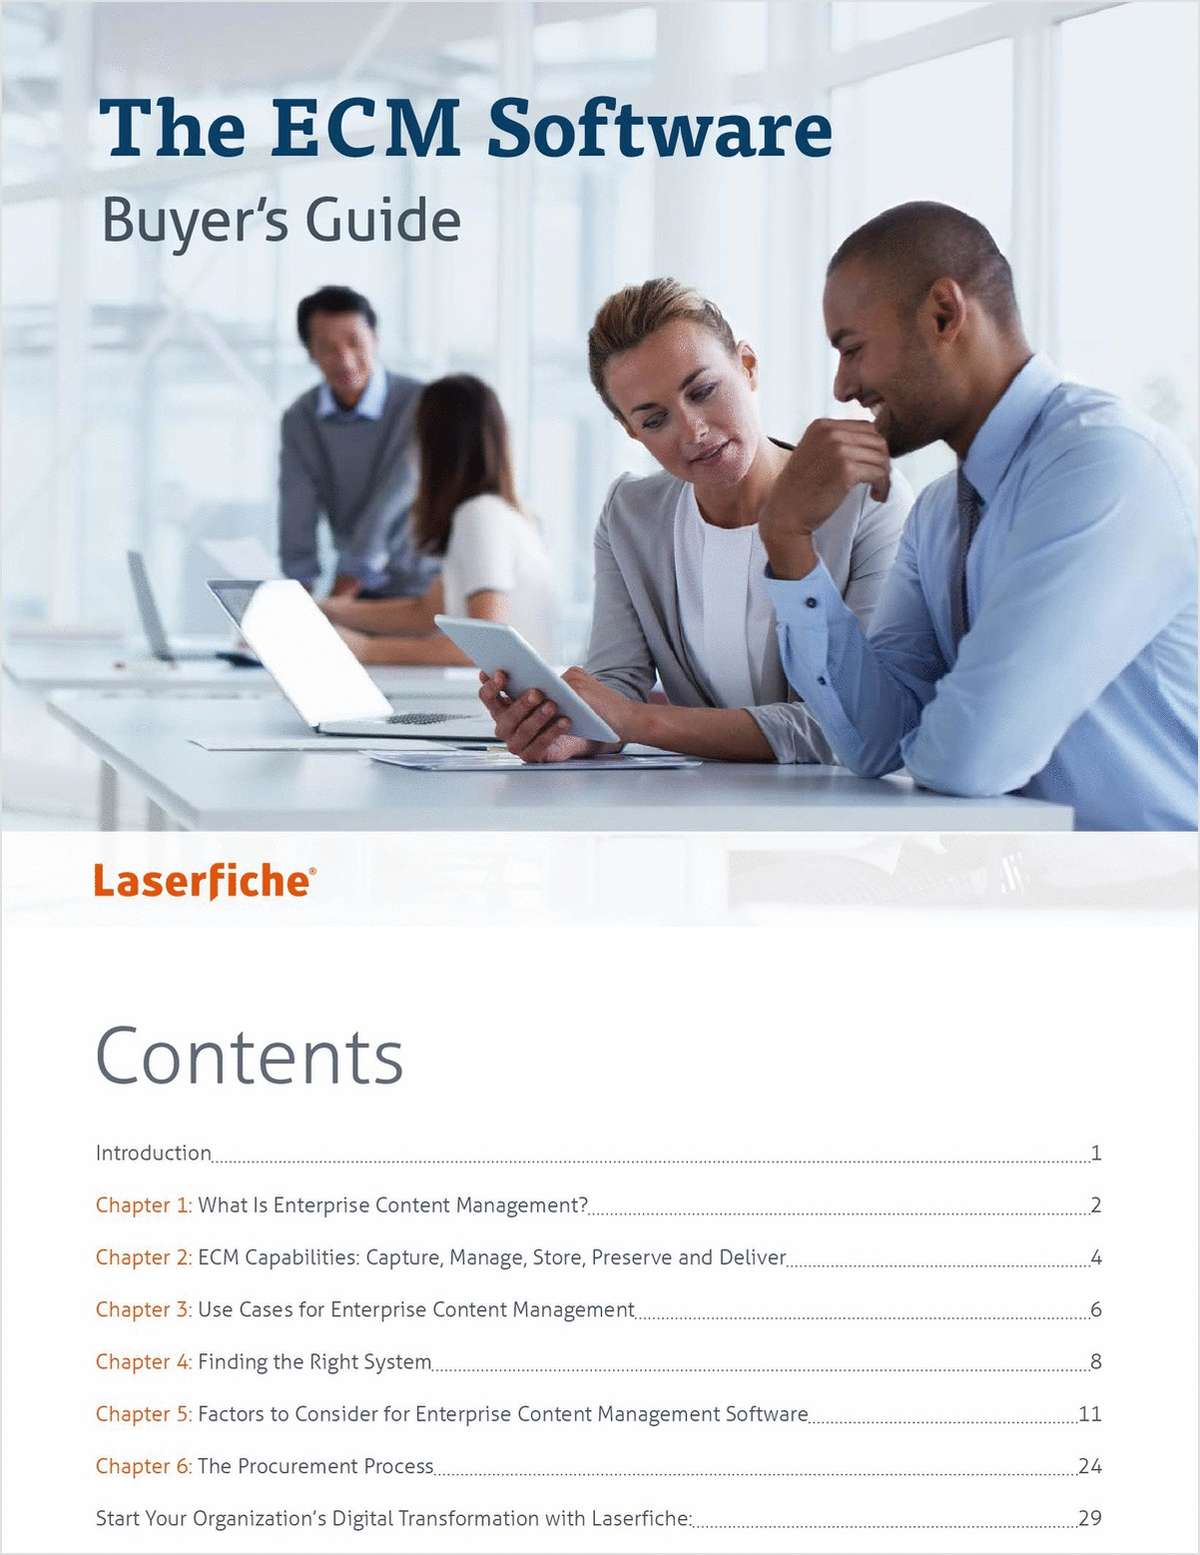 The ECM Software Buyer's Guide